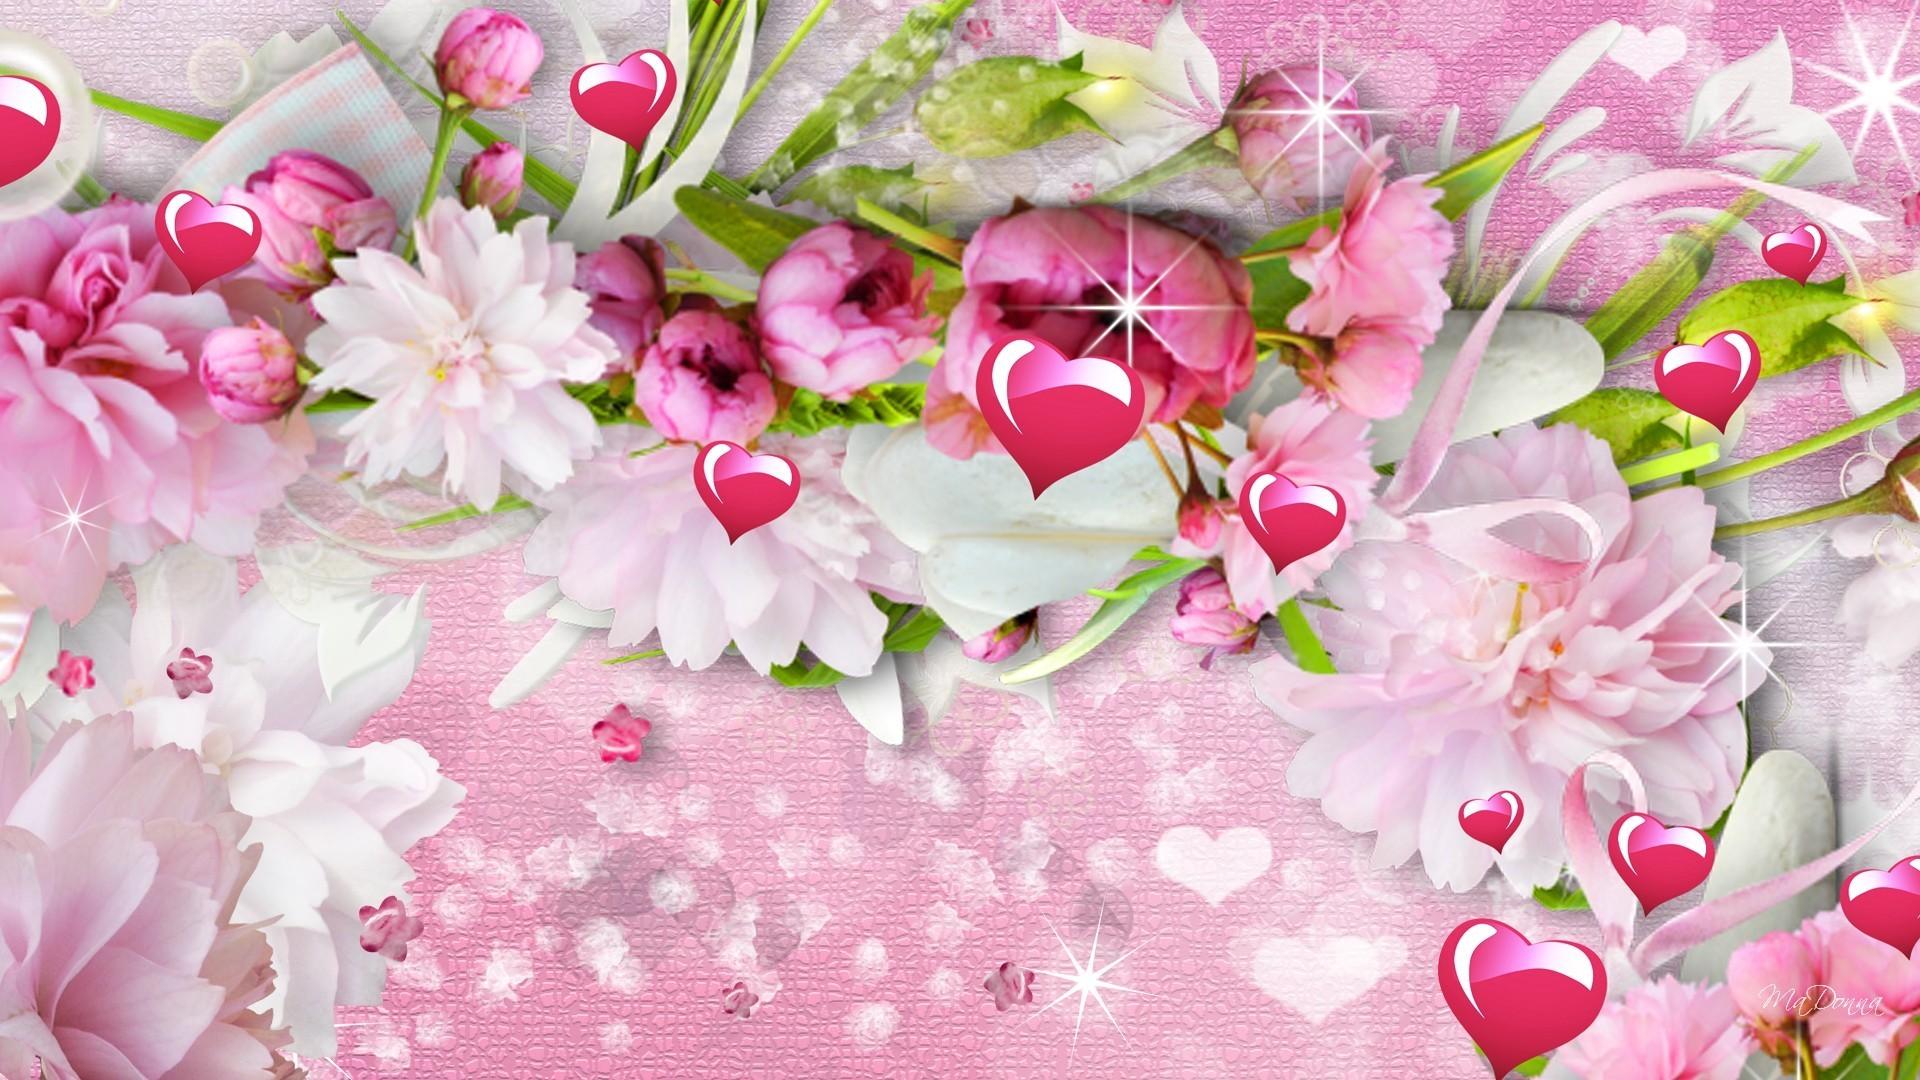 Flowers Summer Spring Hearts Peonies Valentines Sparkle Pink Day Stars  Tropical Flower Desktop Wallpaper Detail